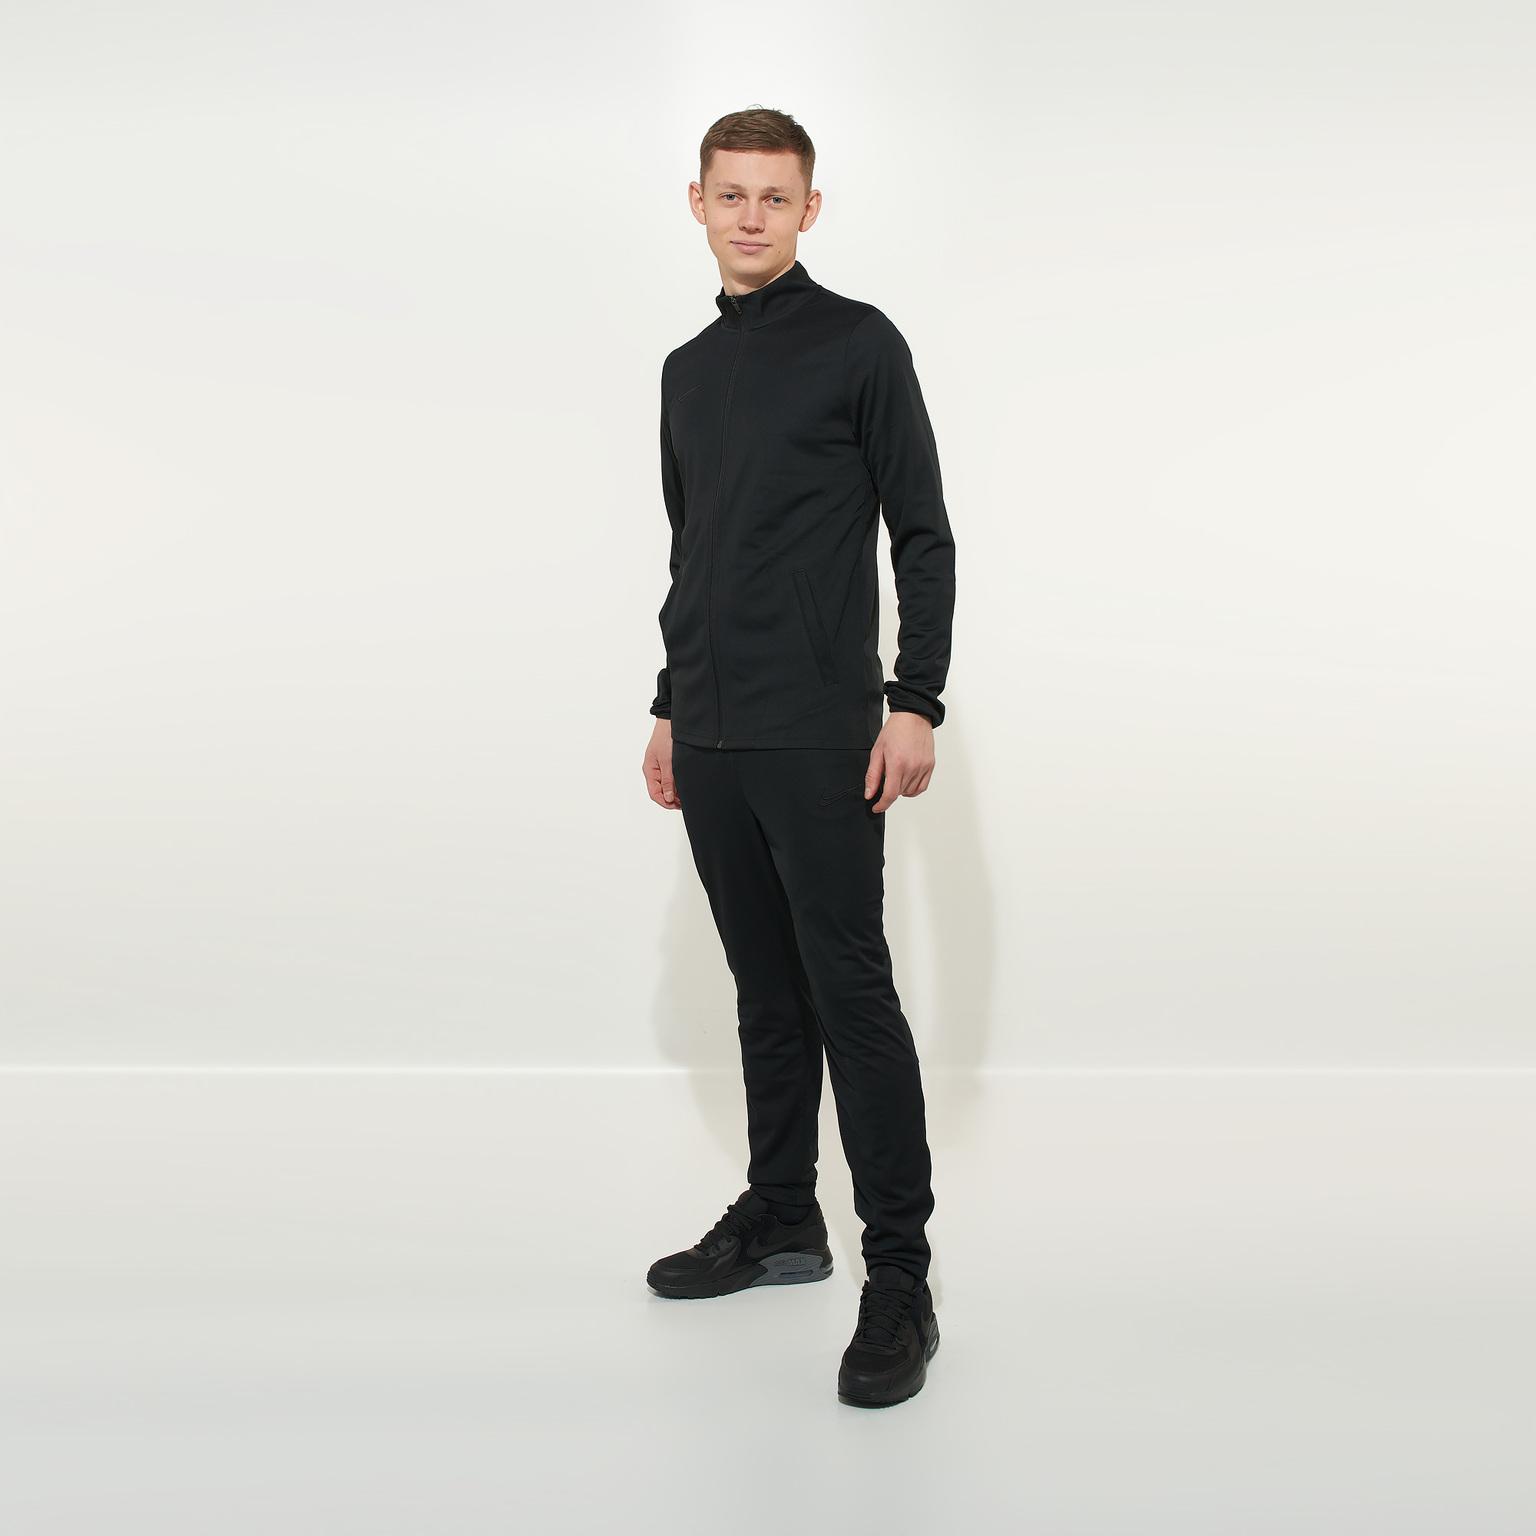 Костюм спортивный Nike Academy21 CW6131-011 костюм спортивный nike spe fleece suit bv3017 058